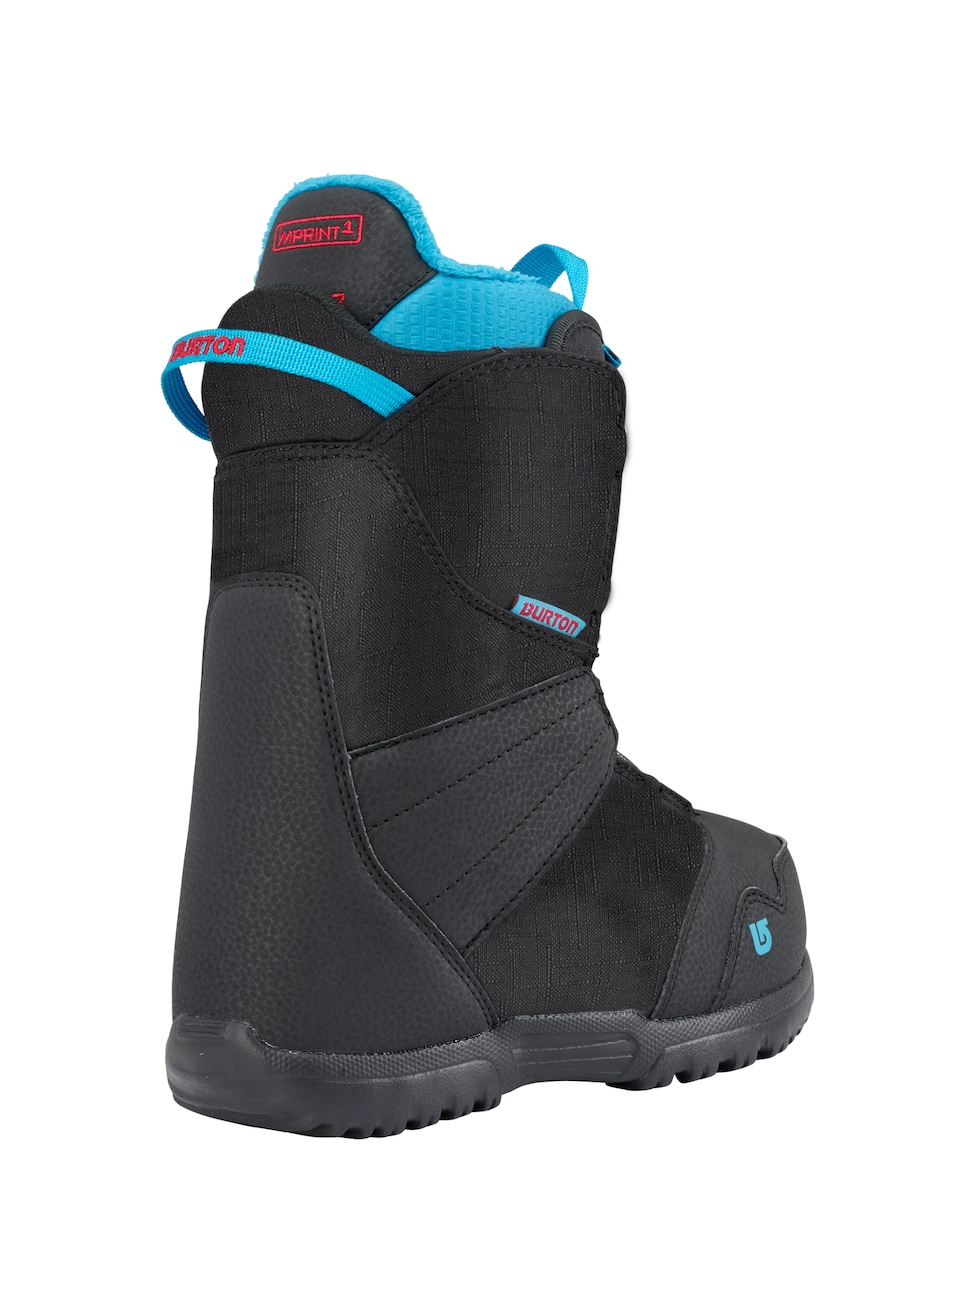 Ботинки Для Сноуборда Burton 2017-18 Zipline Boa Black